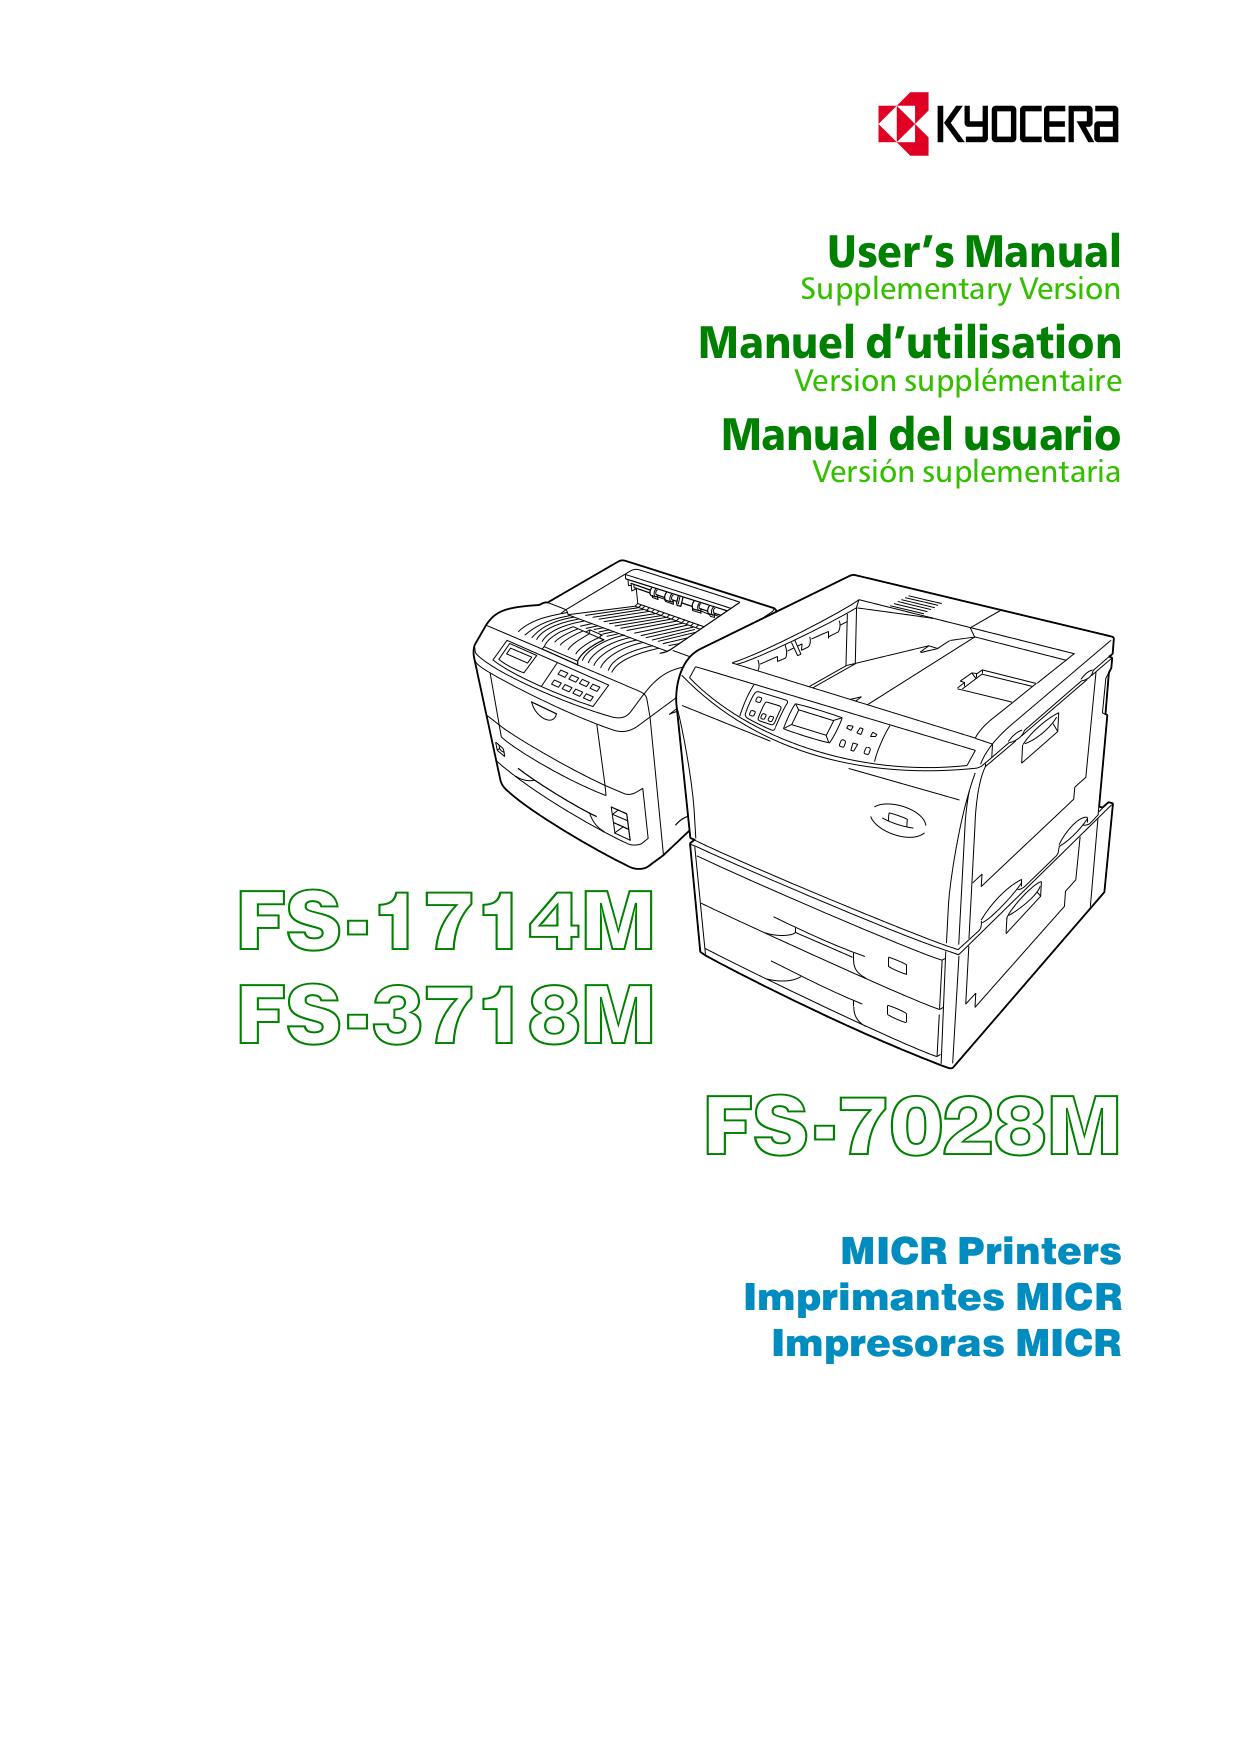 pdf for Kyocera Printer FS-3718M manual